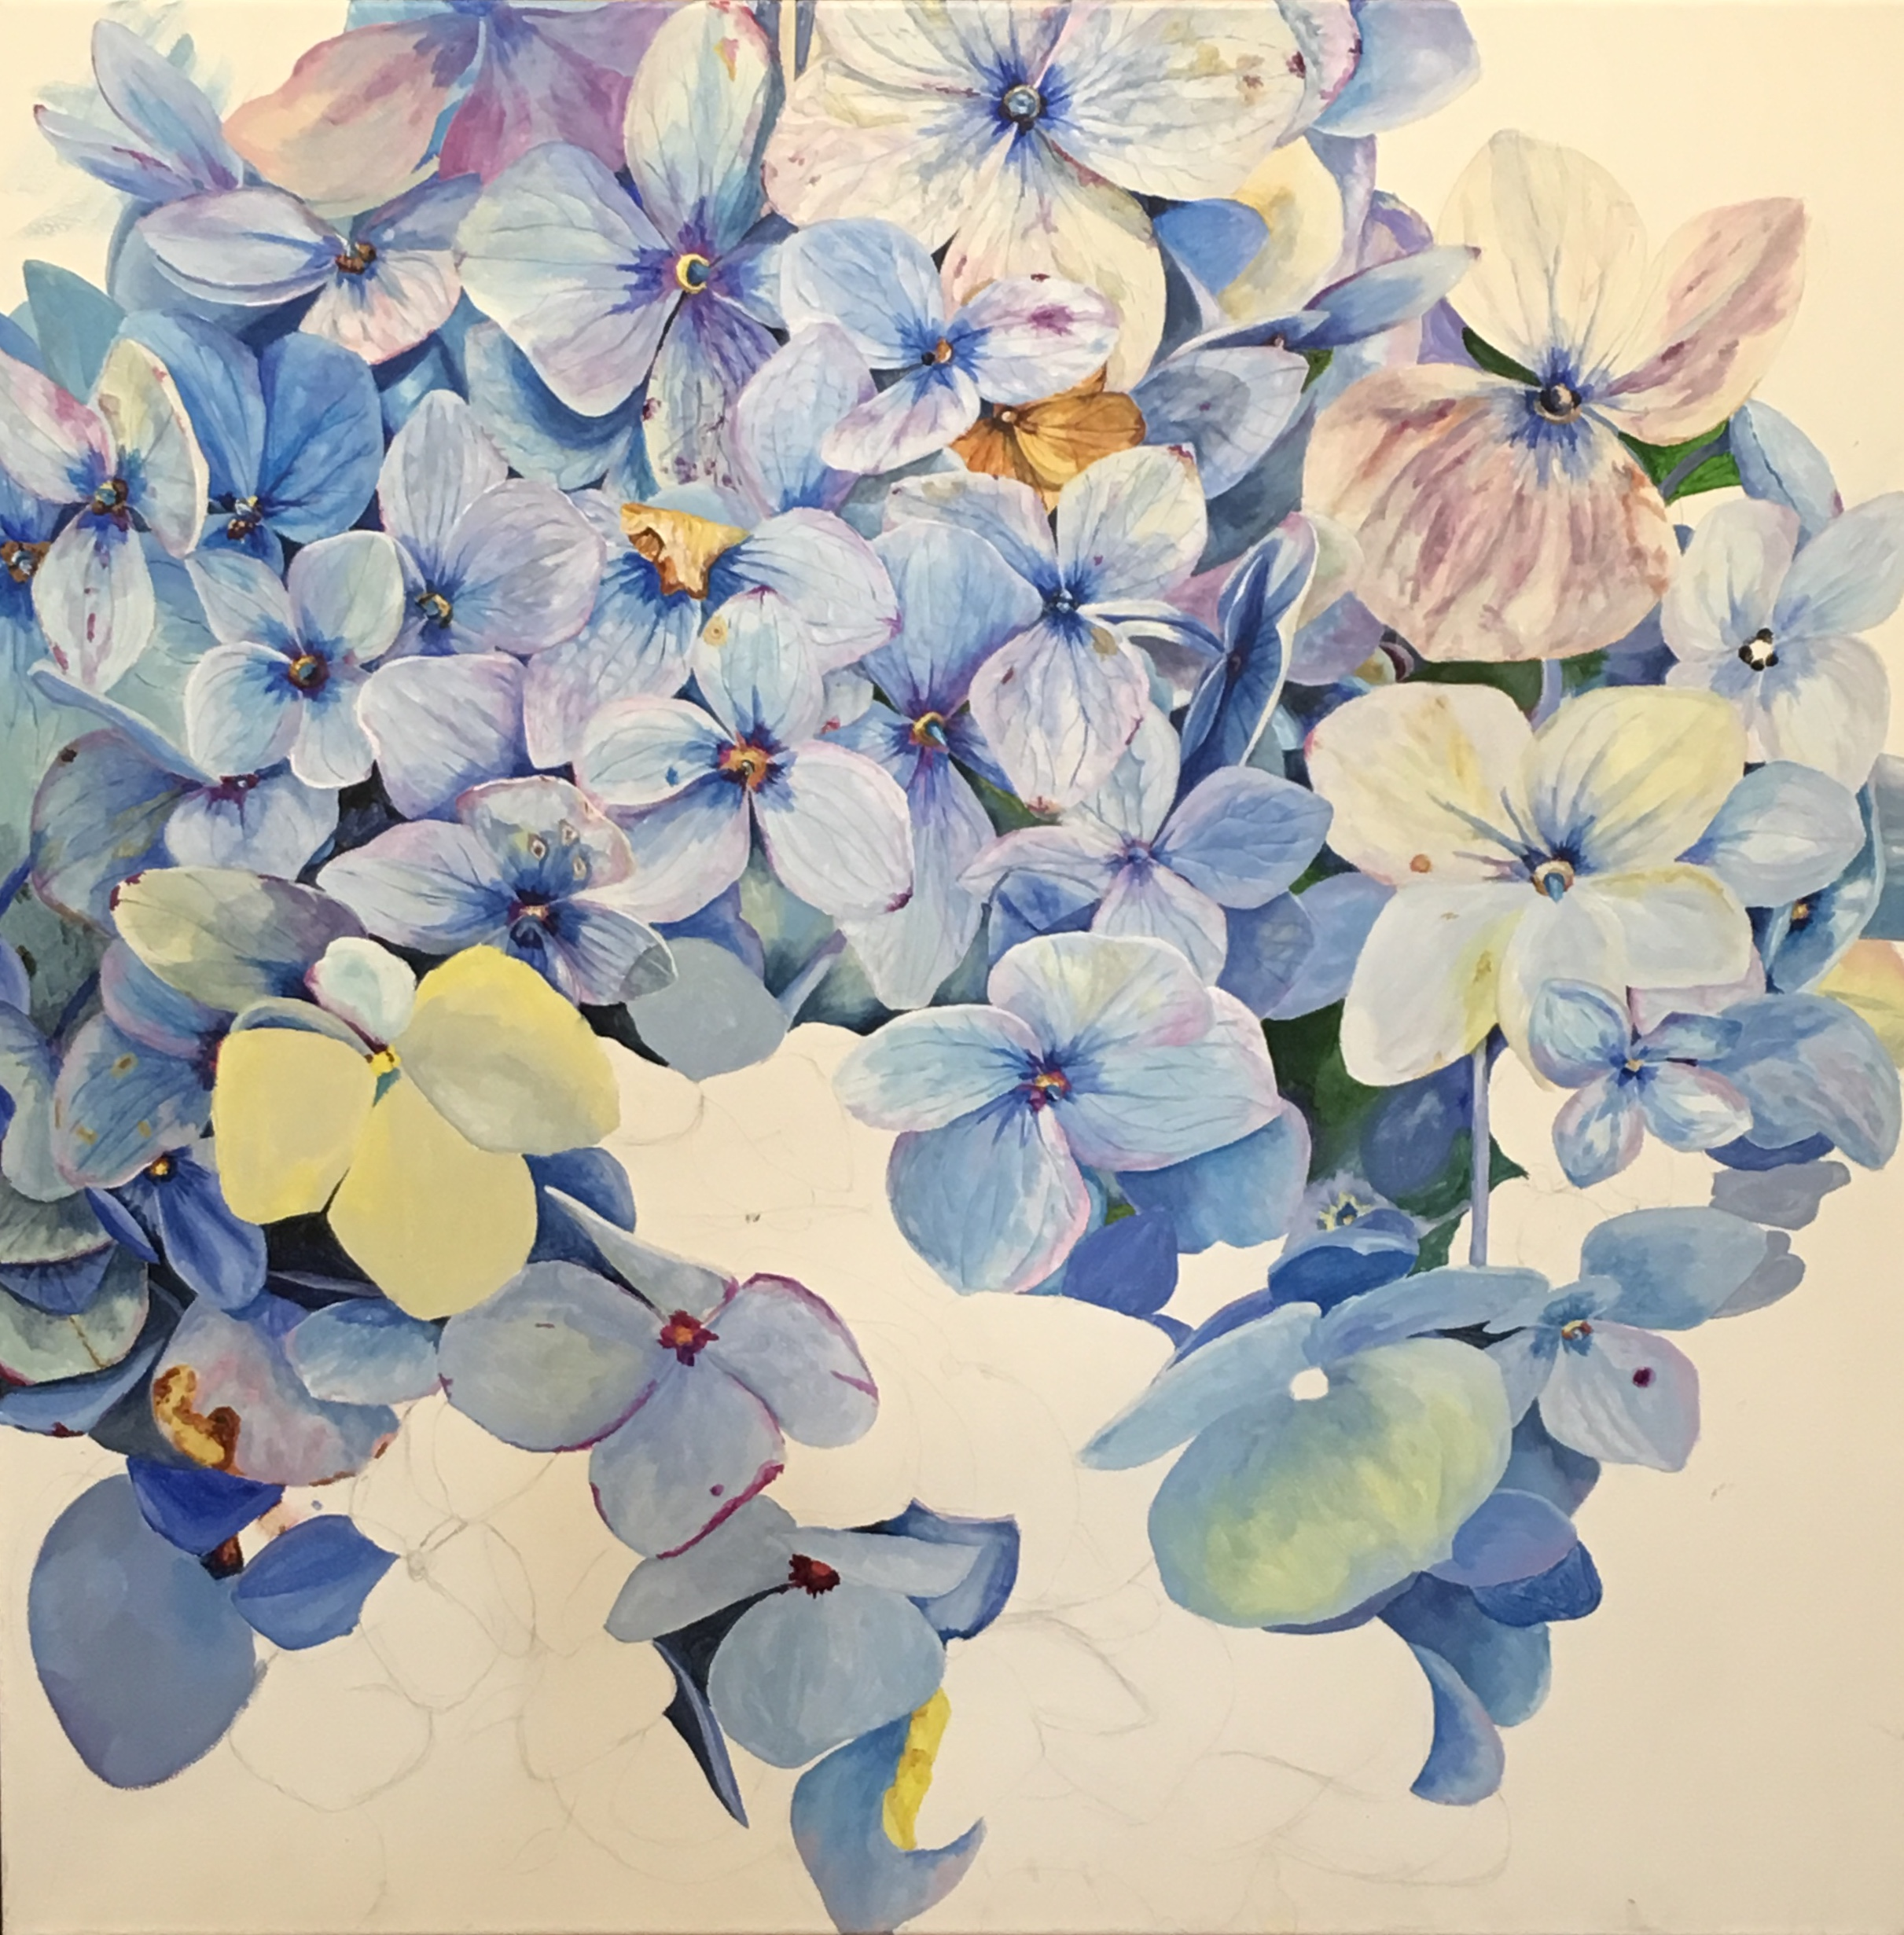 WIP Tender Blue by Helen Shideler